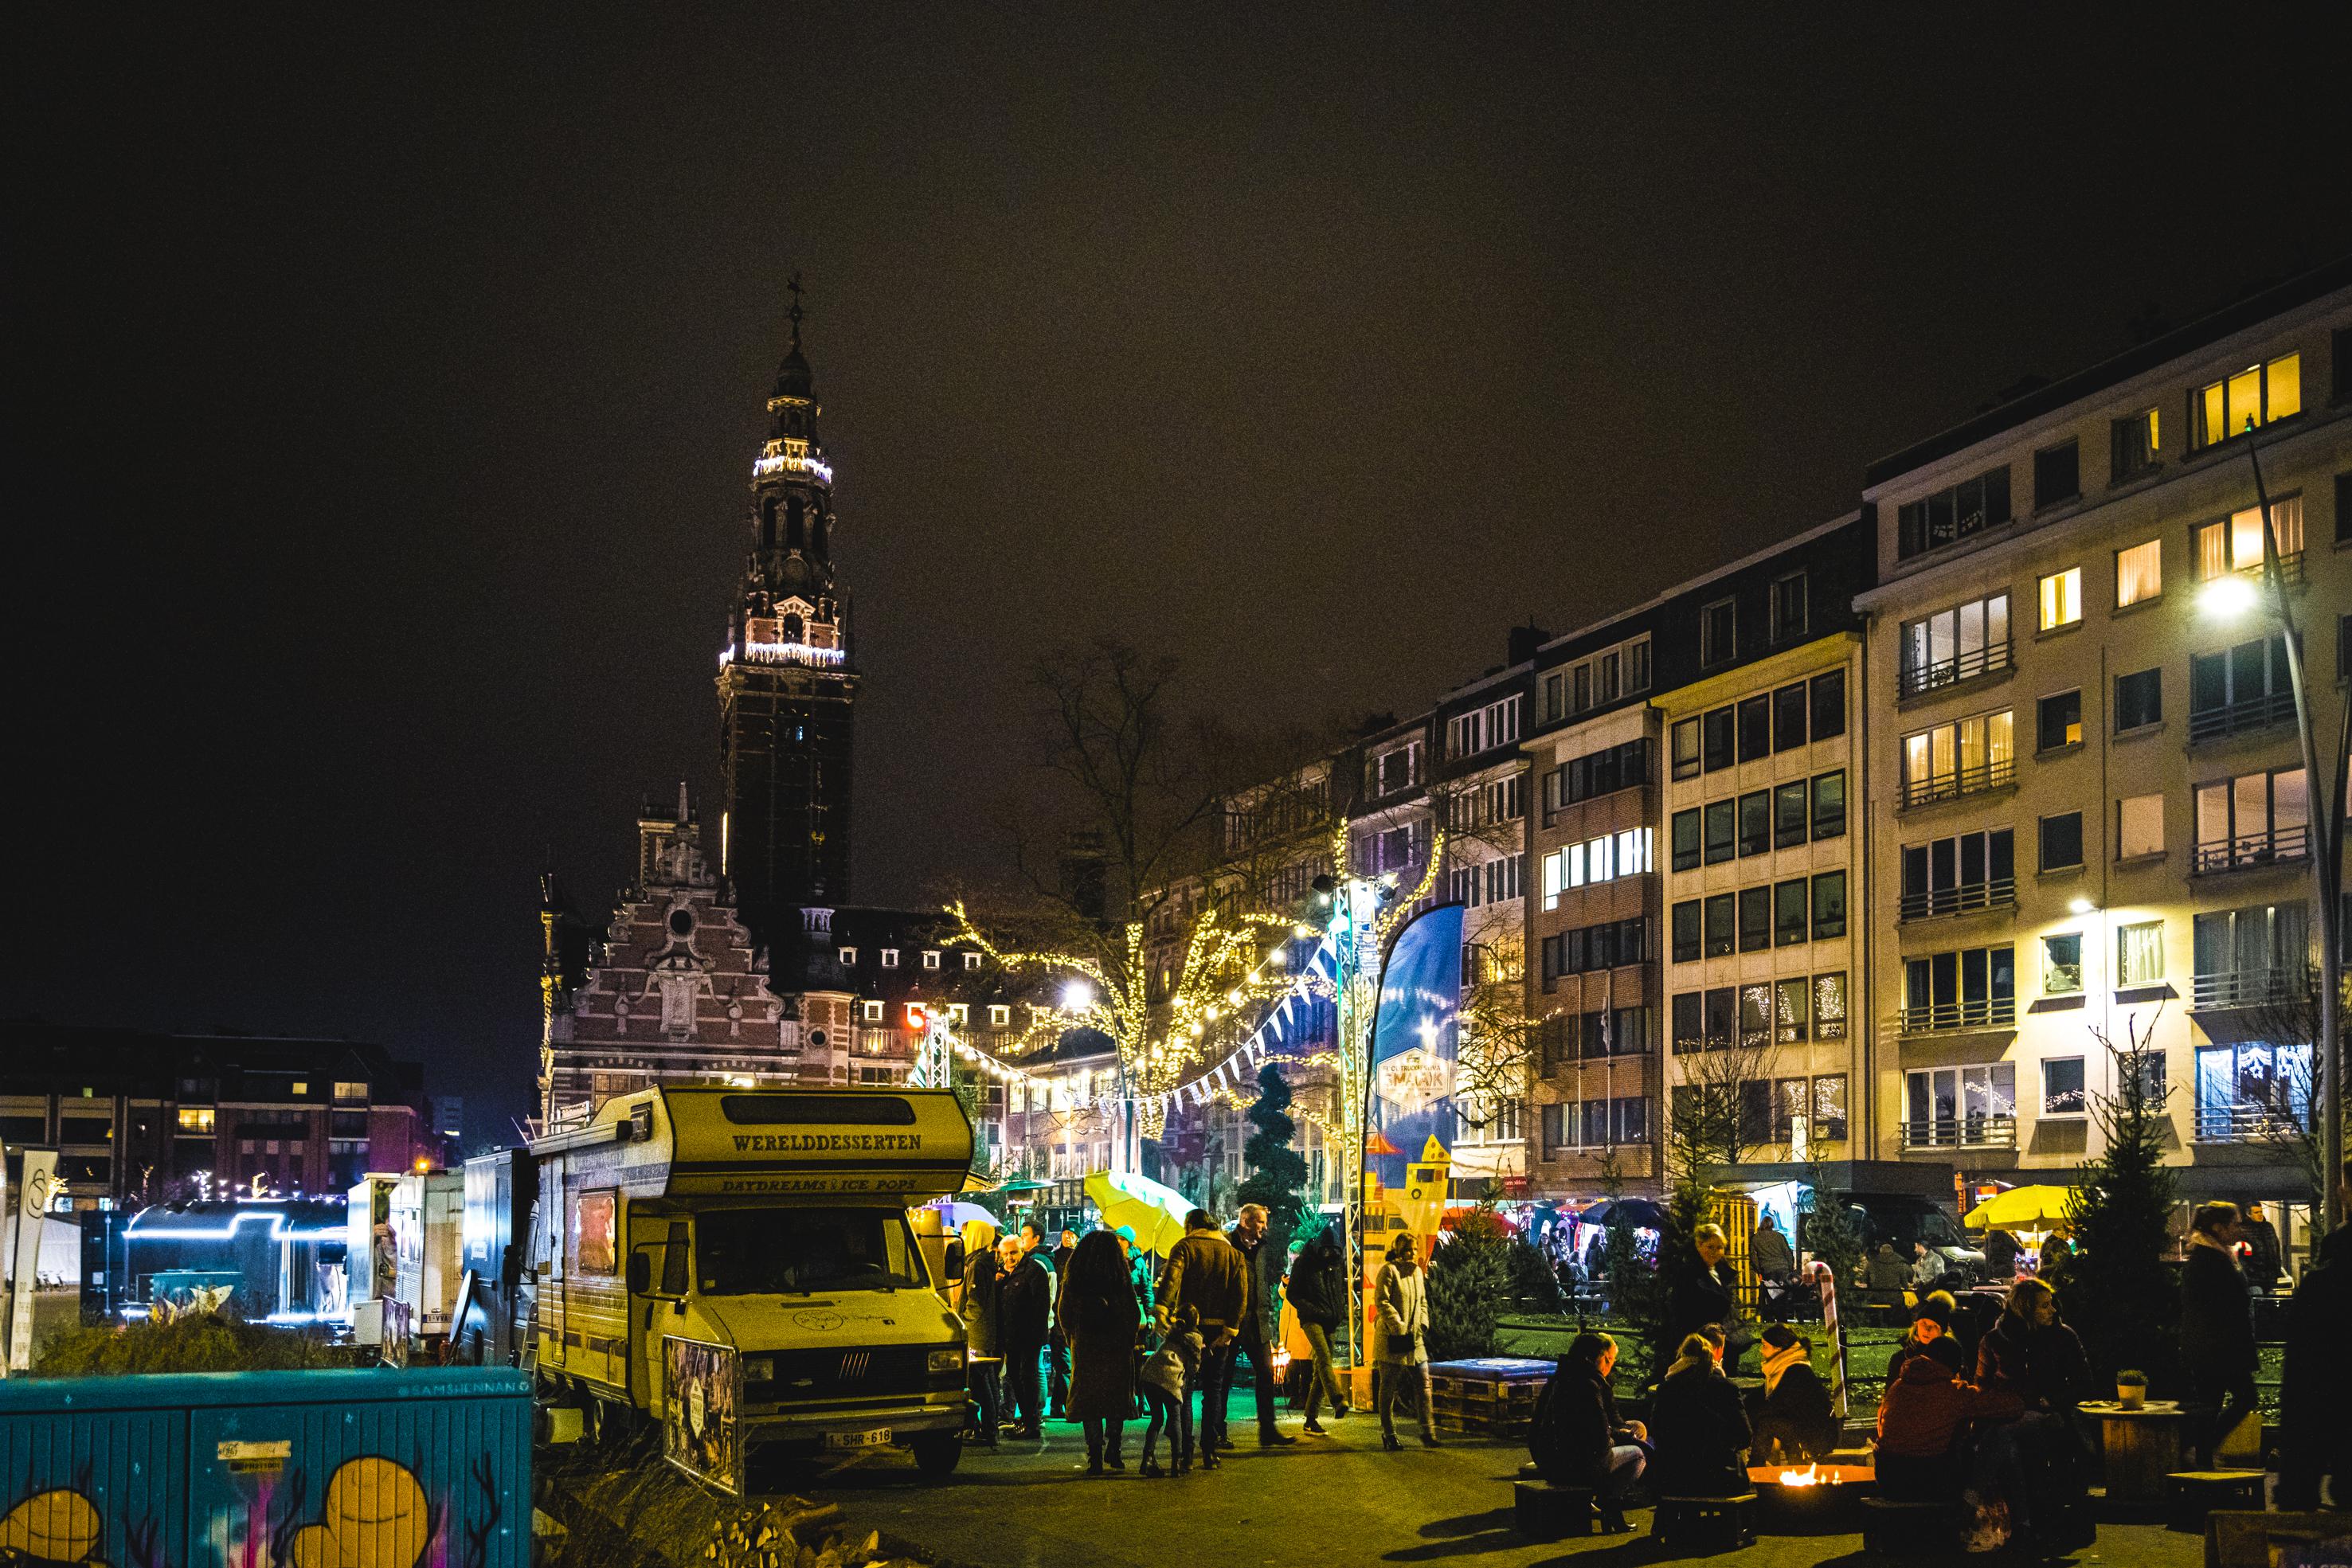 Wintertijd in Leuven | Stad Leuven